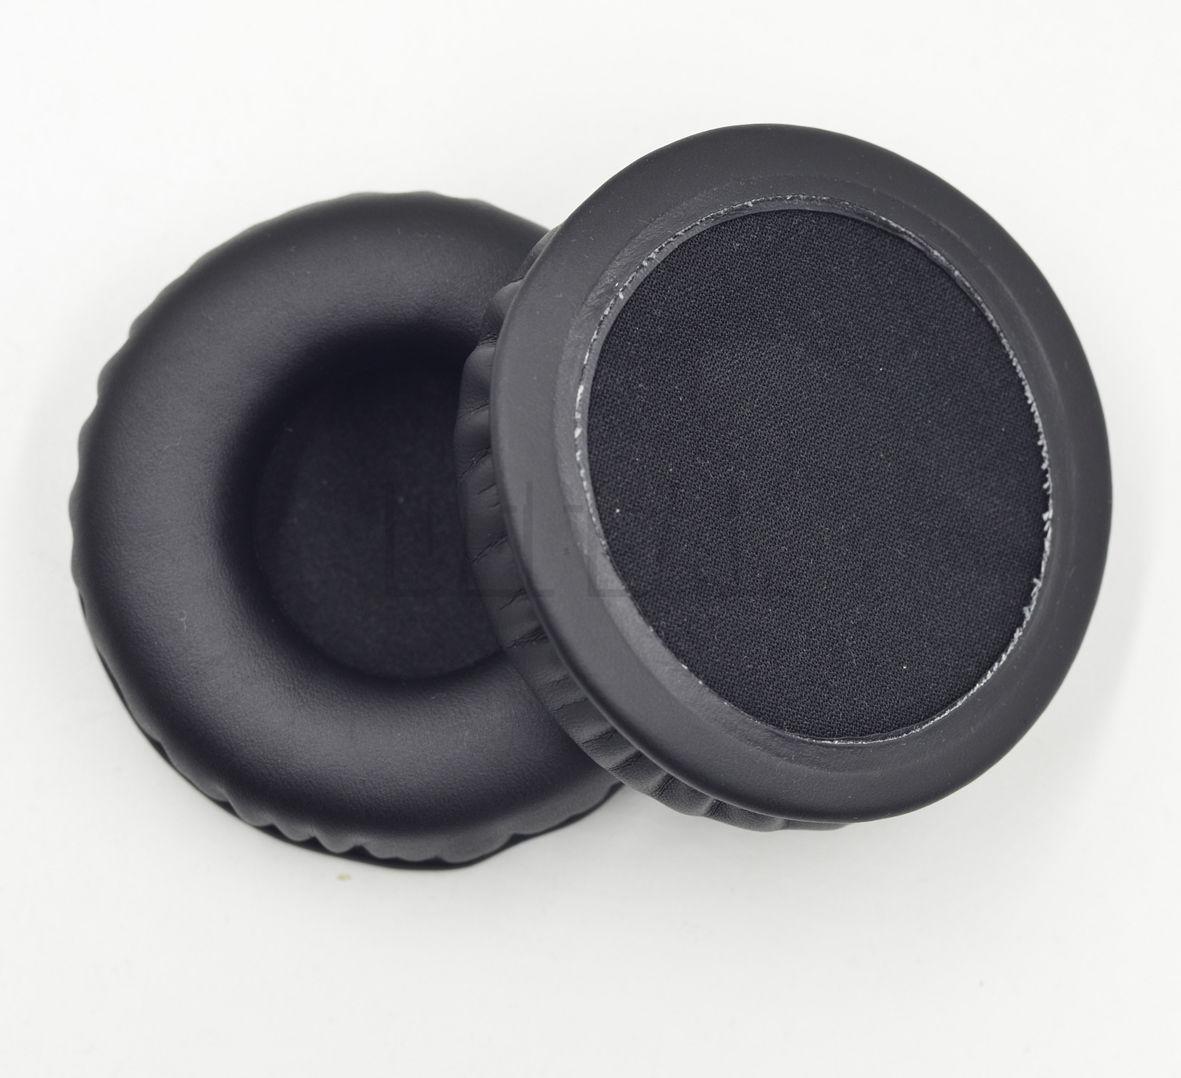 bilder für Ohrpolster kissen ohrpolster ohrpolster für jbl synchros e40bt e40 bt wireless headset